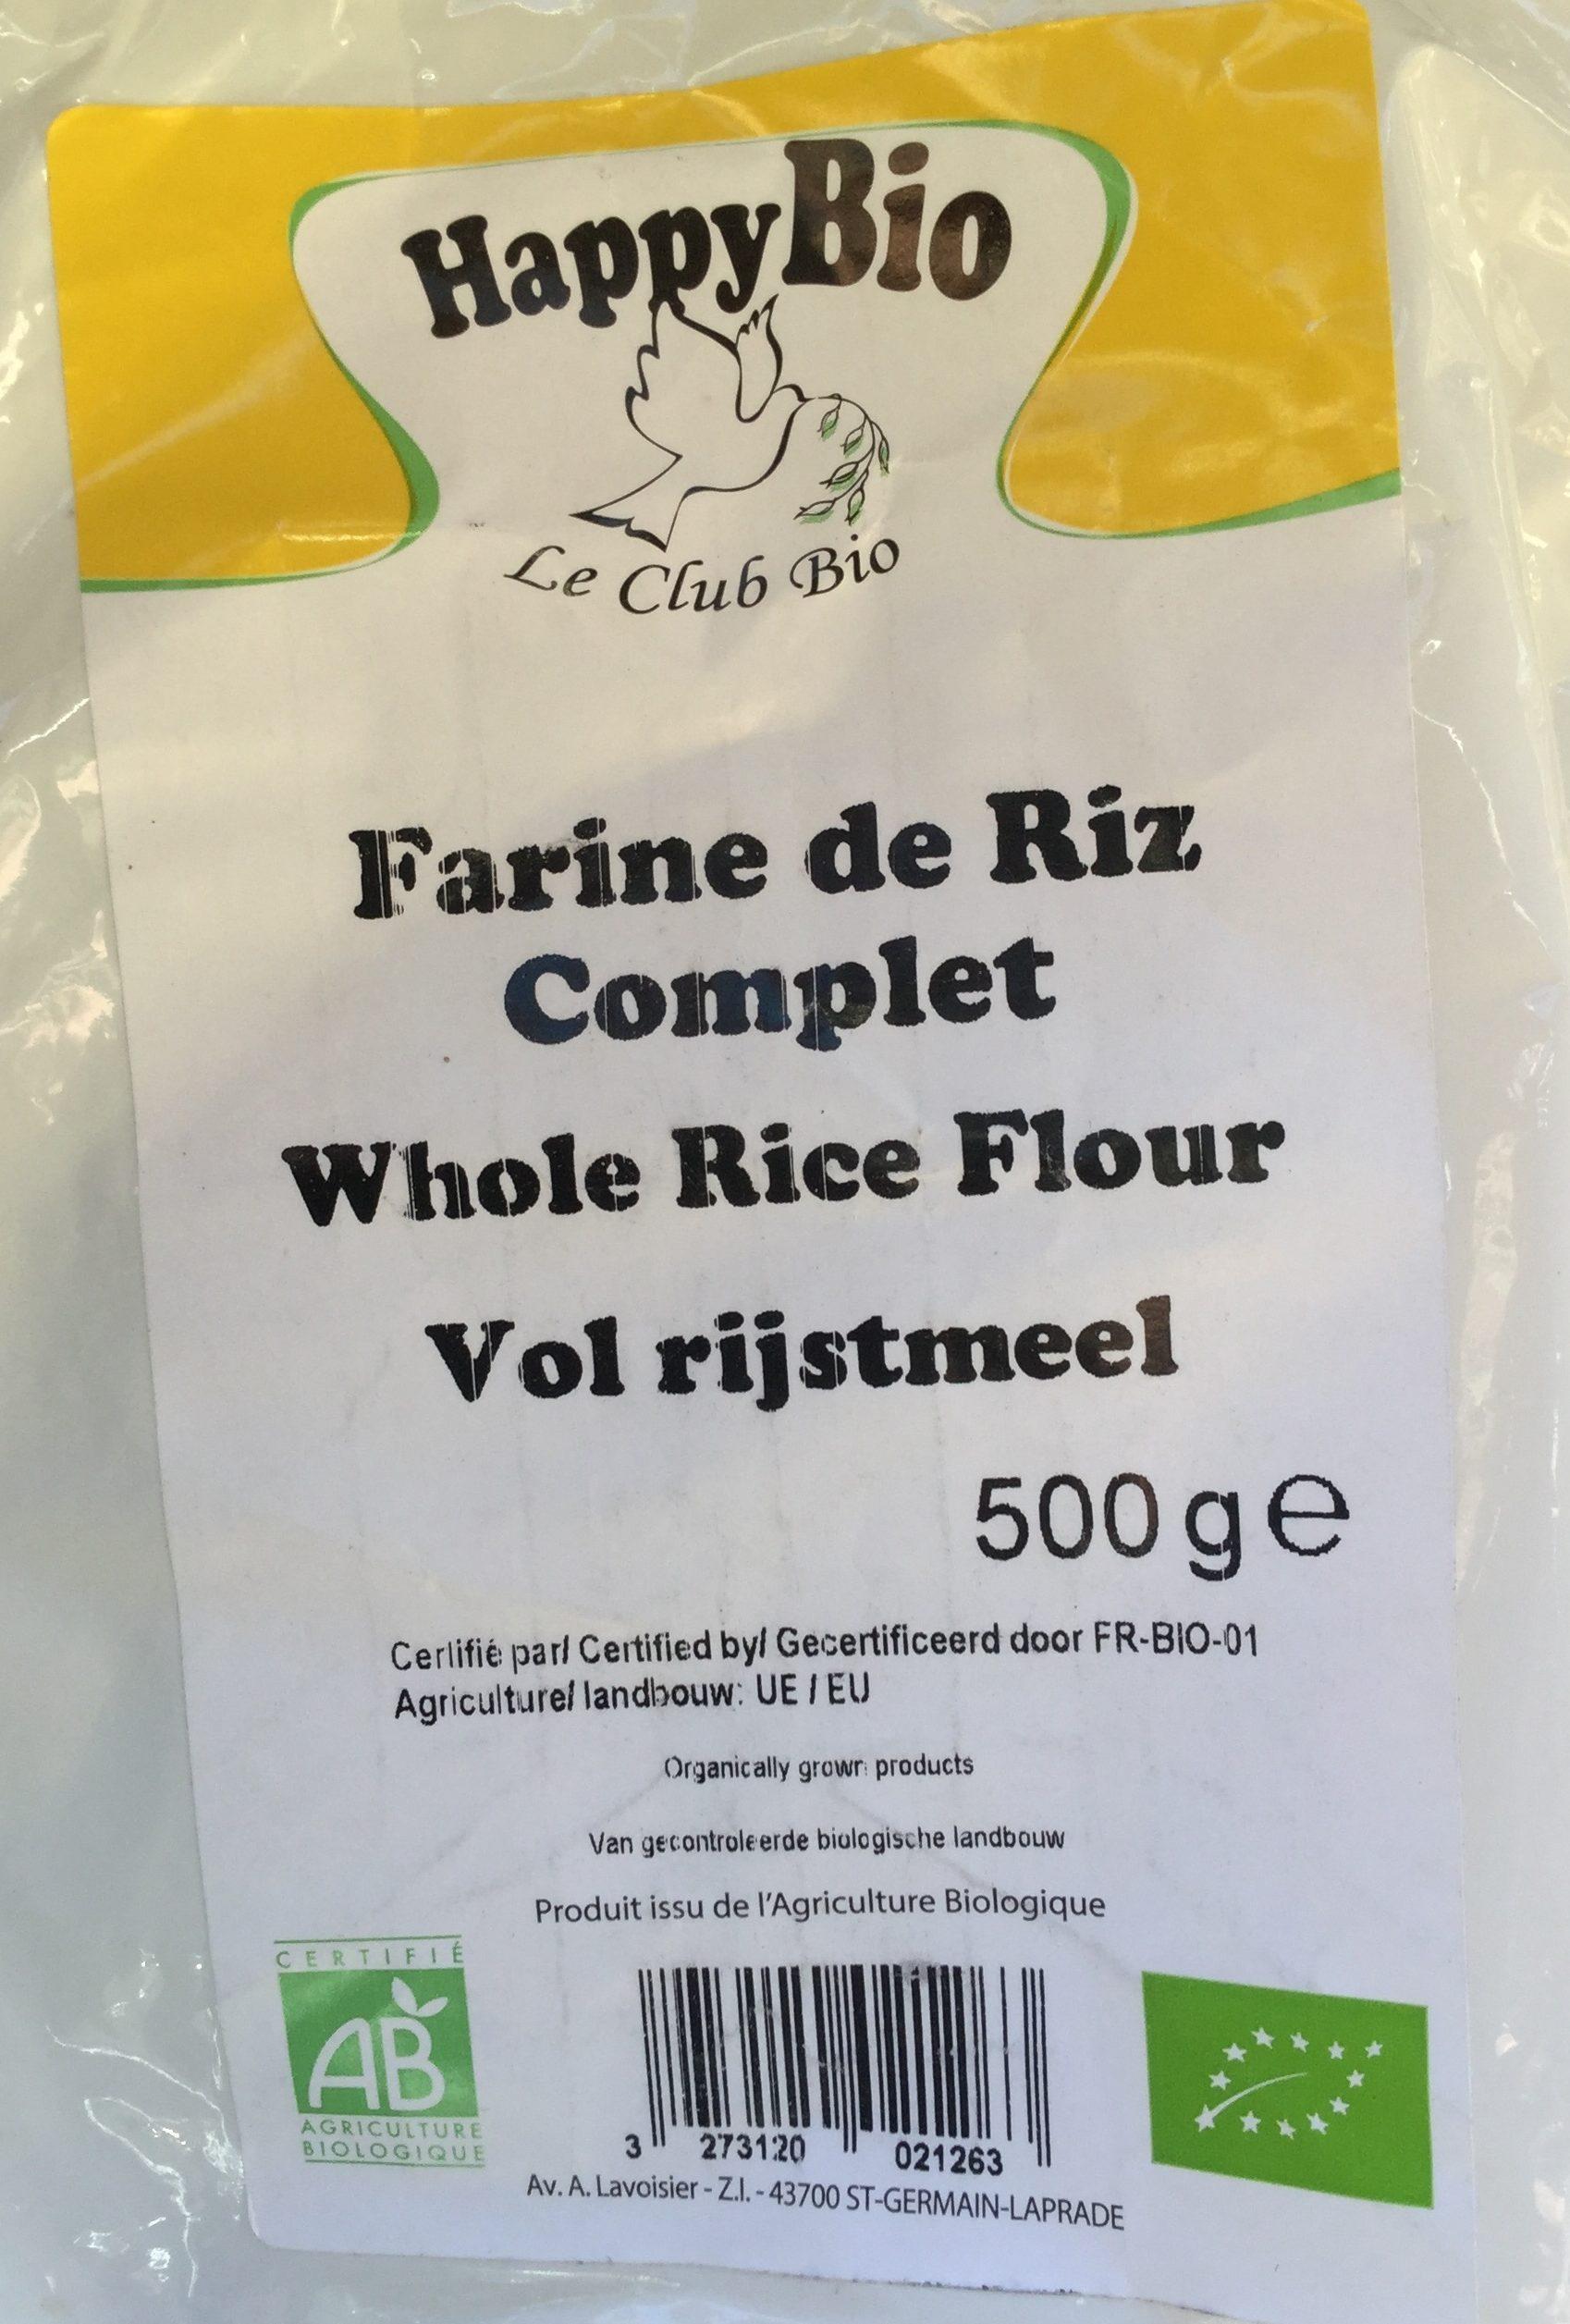 Farine de riz complet - Product - fr